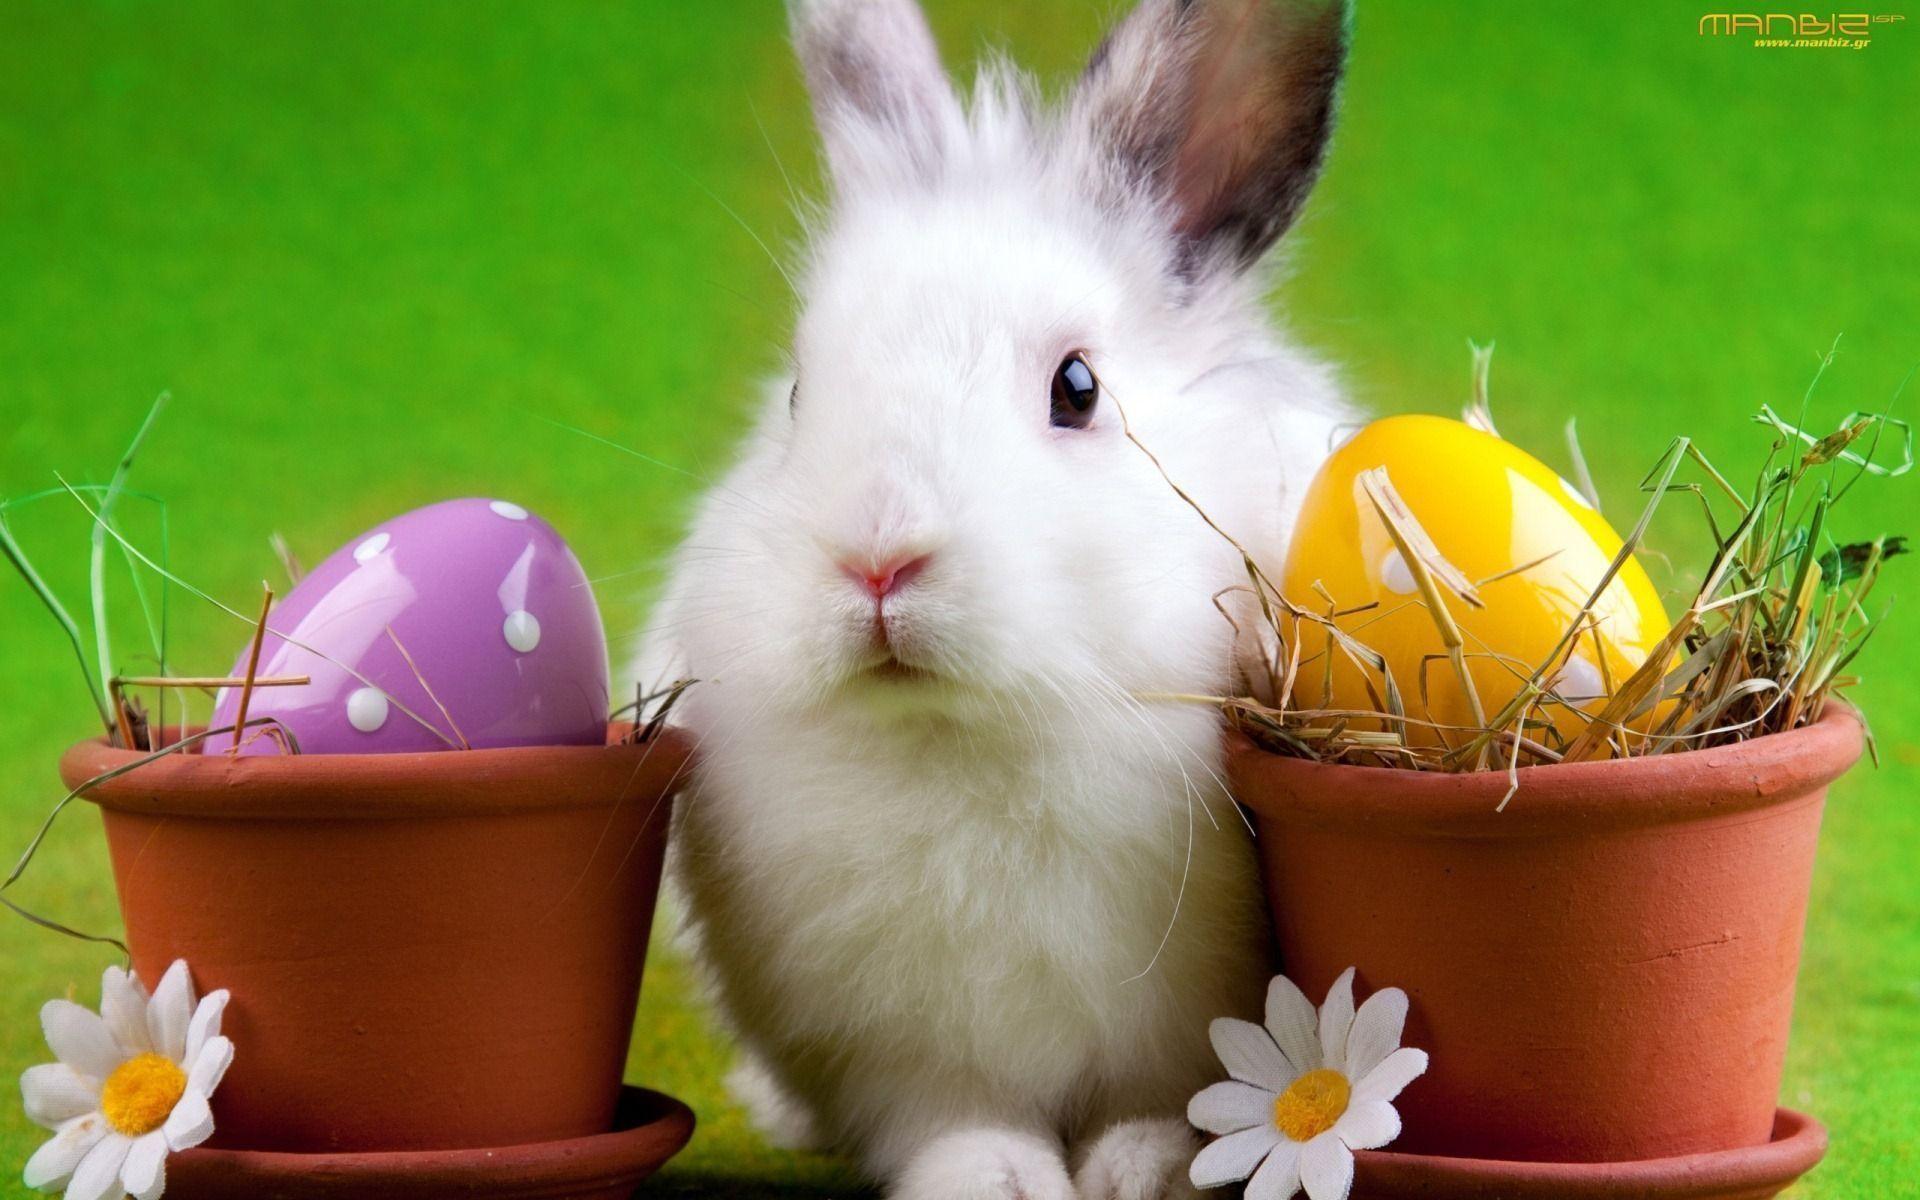 easter bunny wallpaper desktop1 Easter Bunny Wallpaper Desktop .